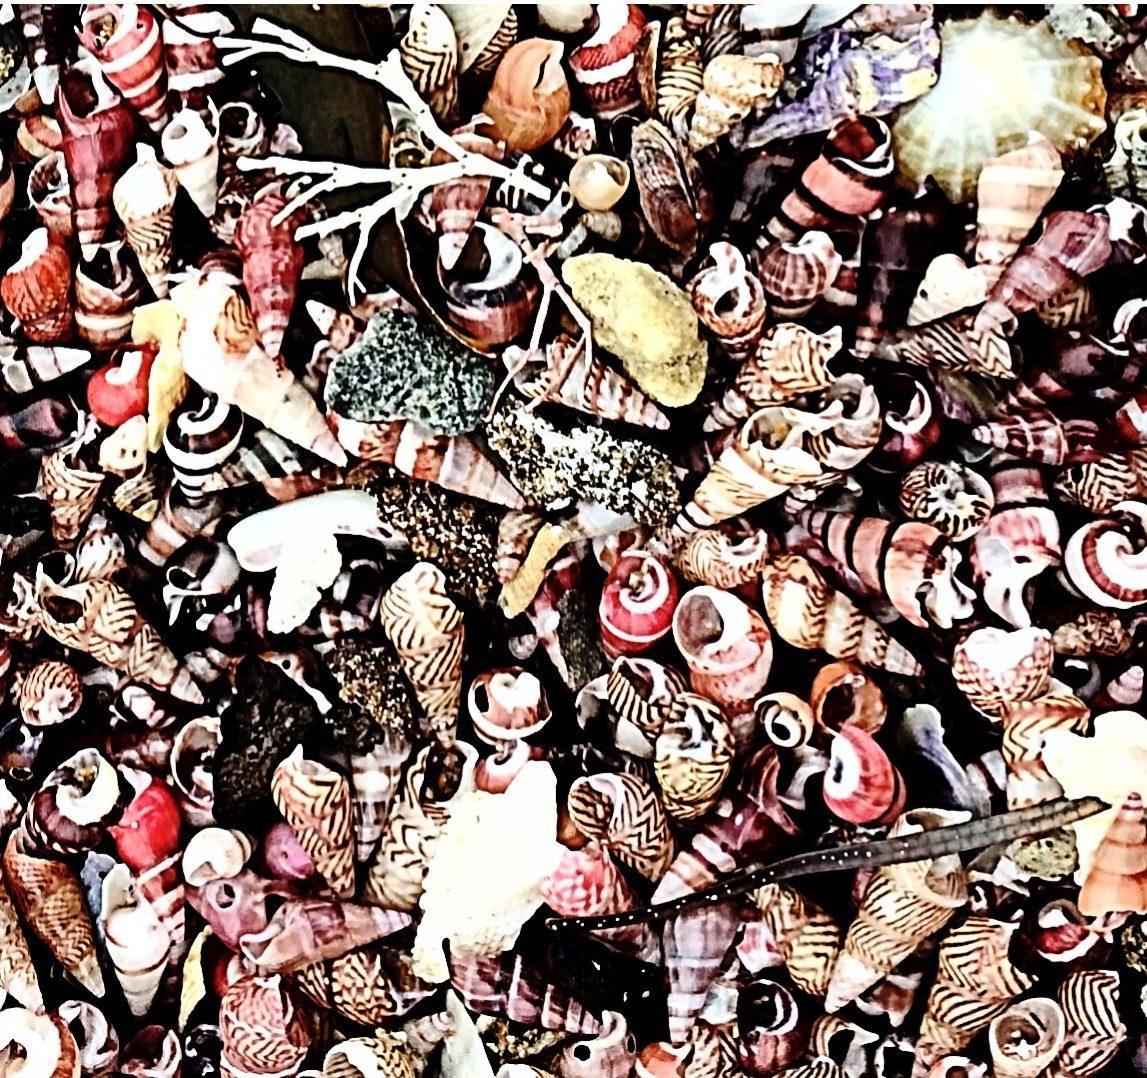 Southern NSW shells